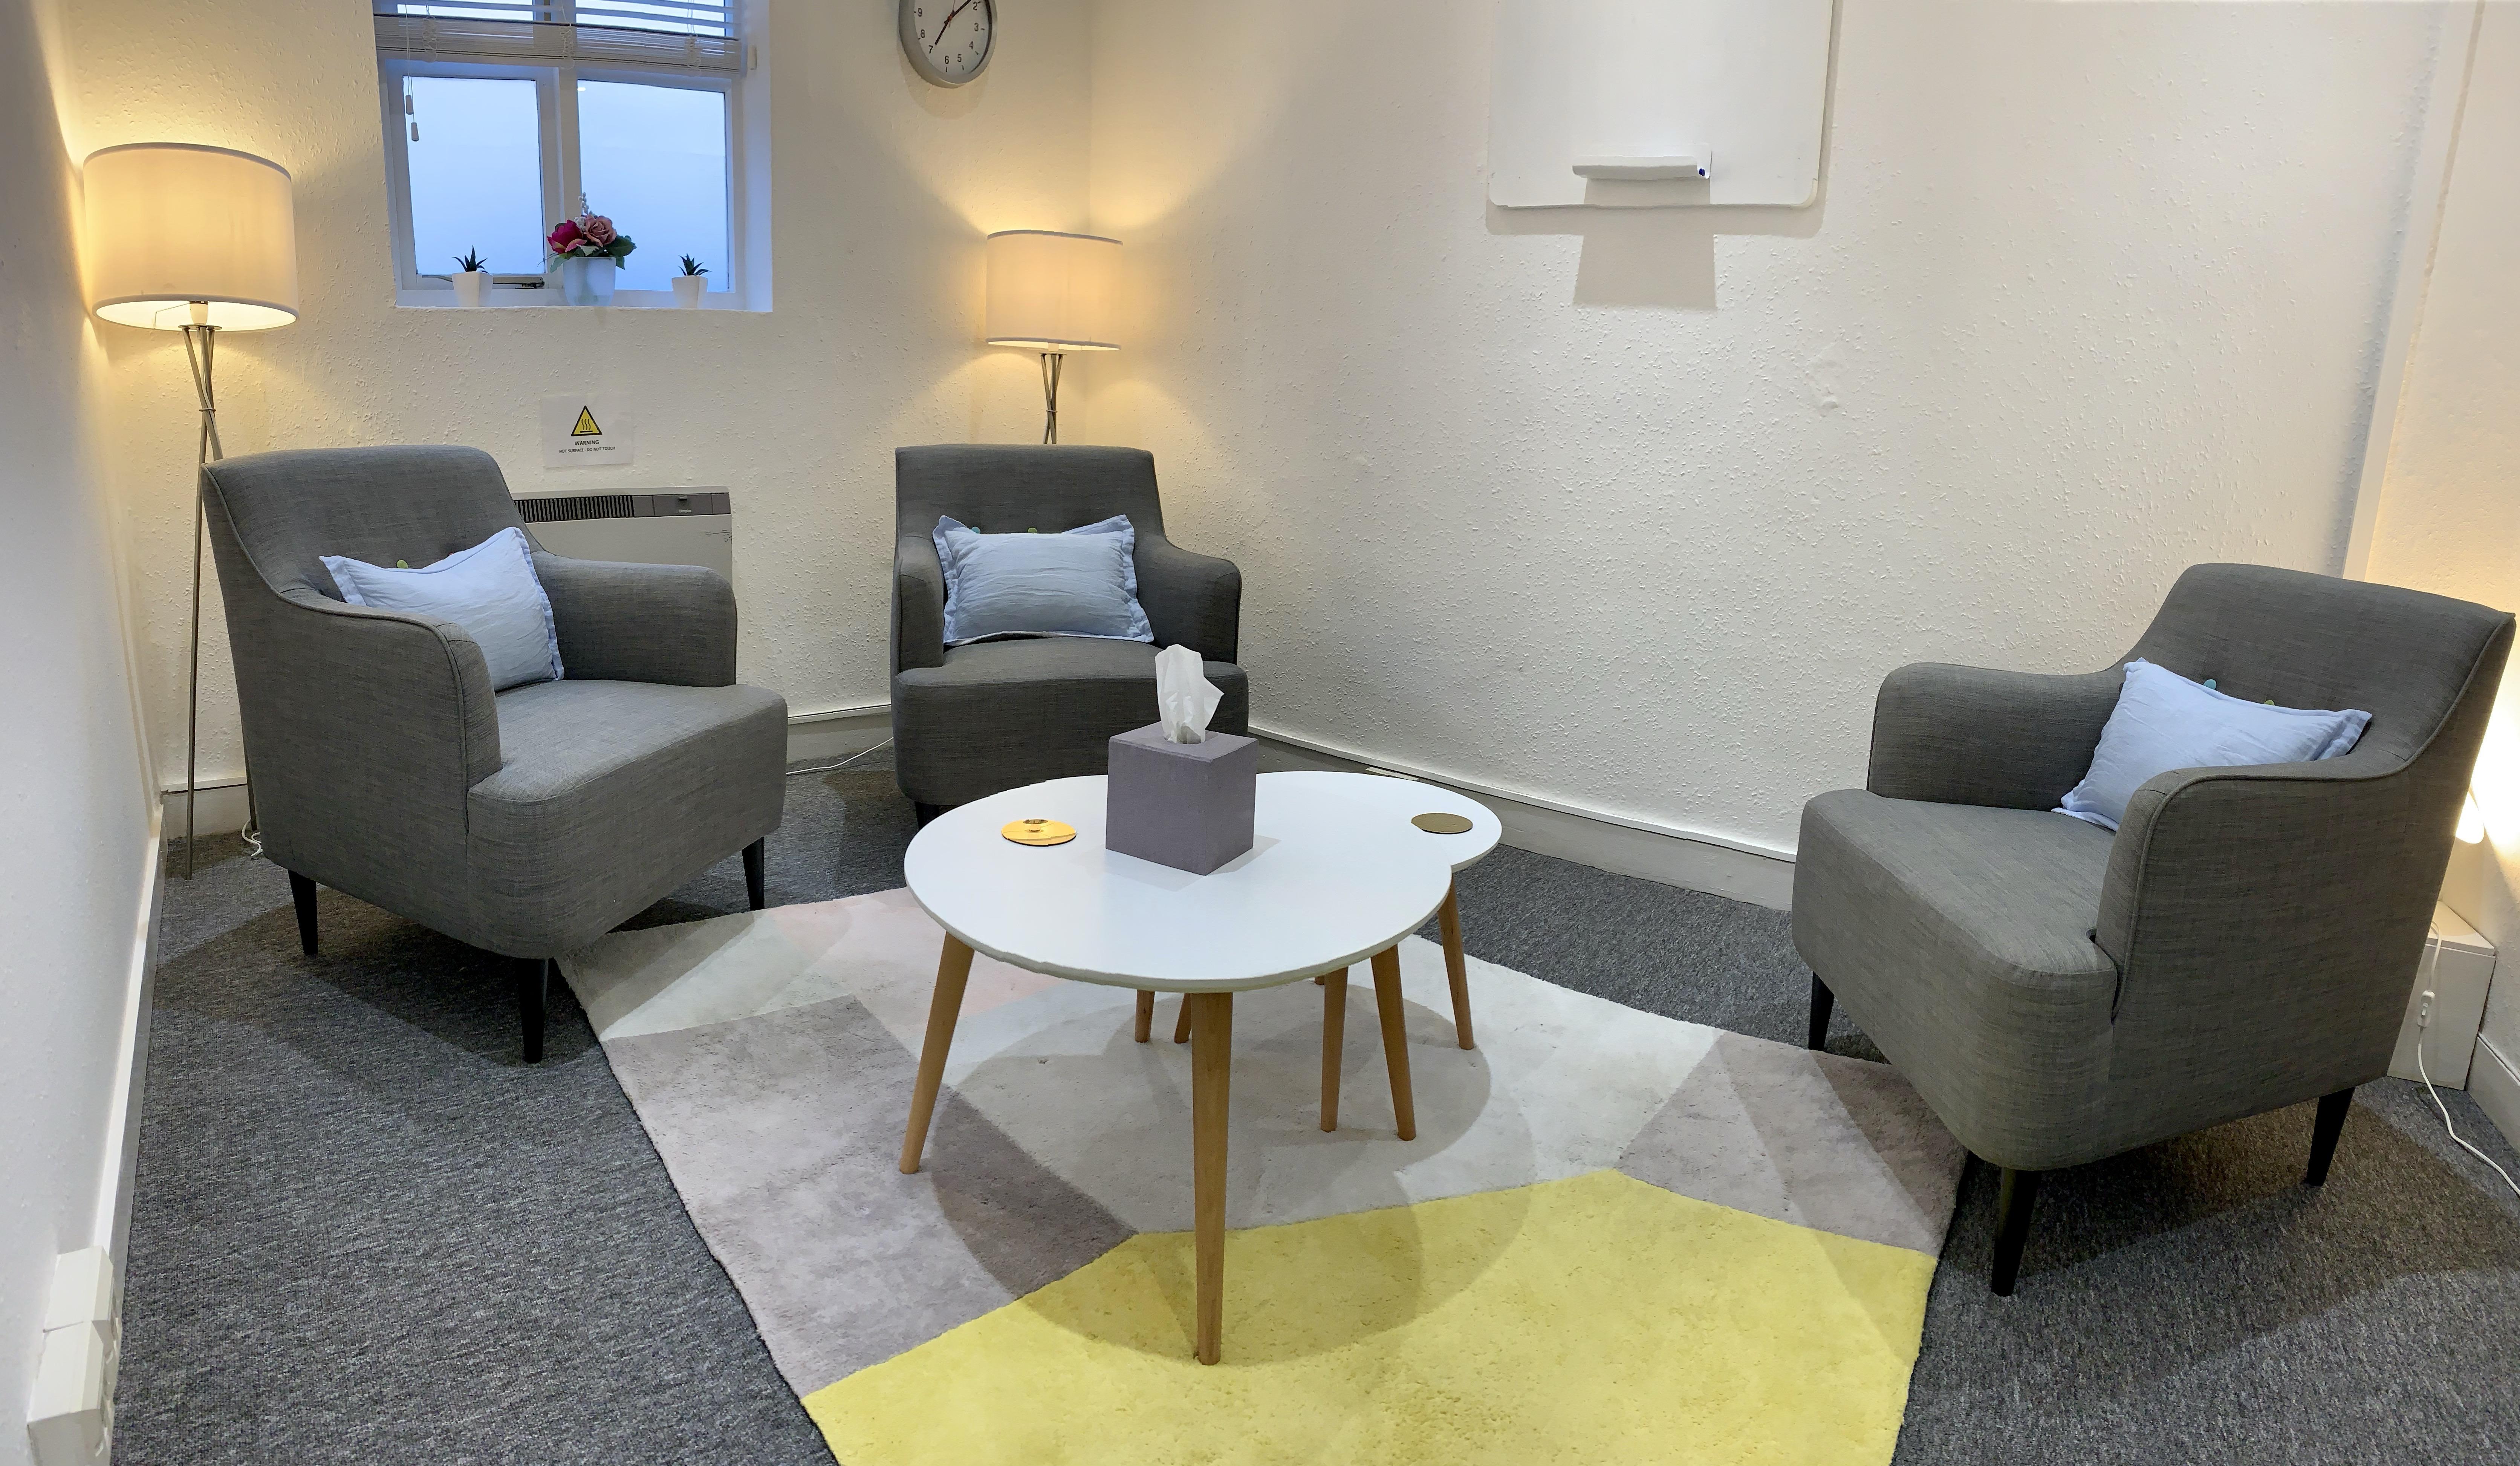 Room 3 Ware Clinic